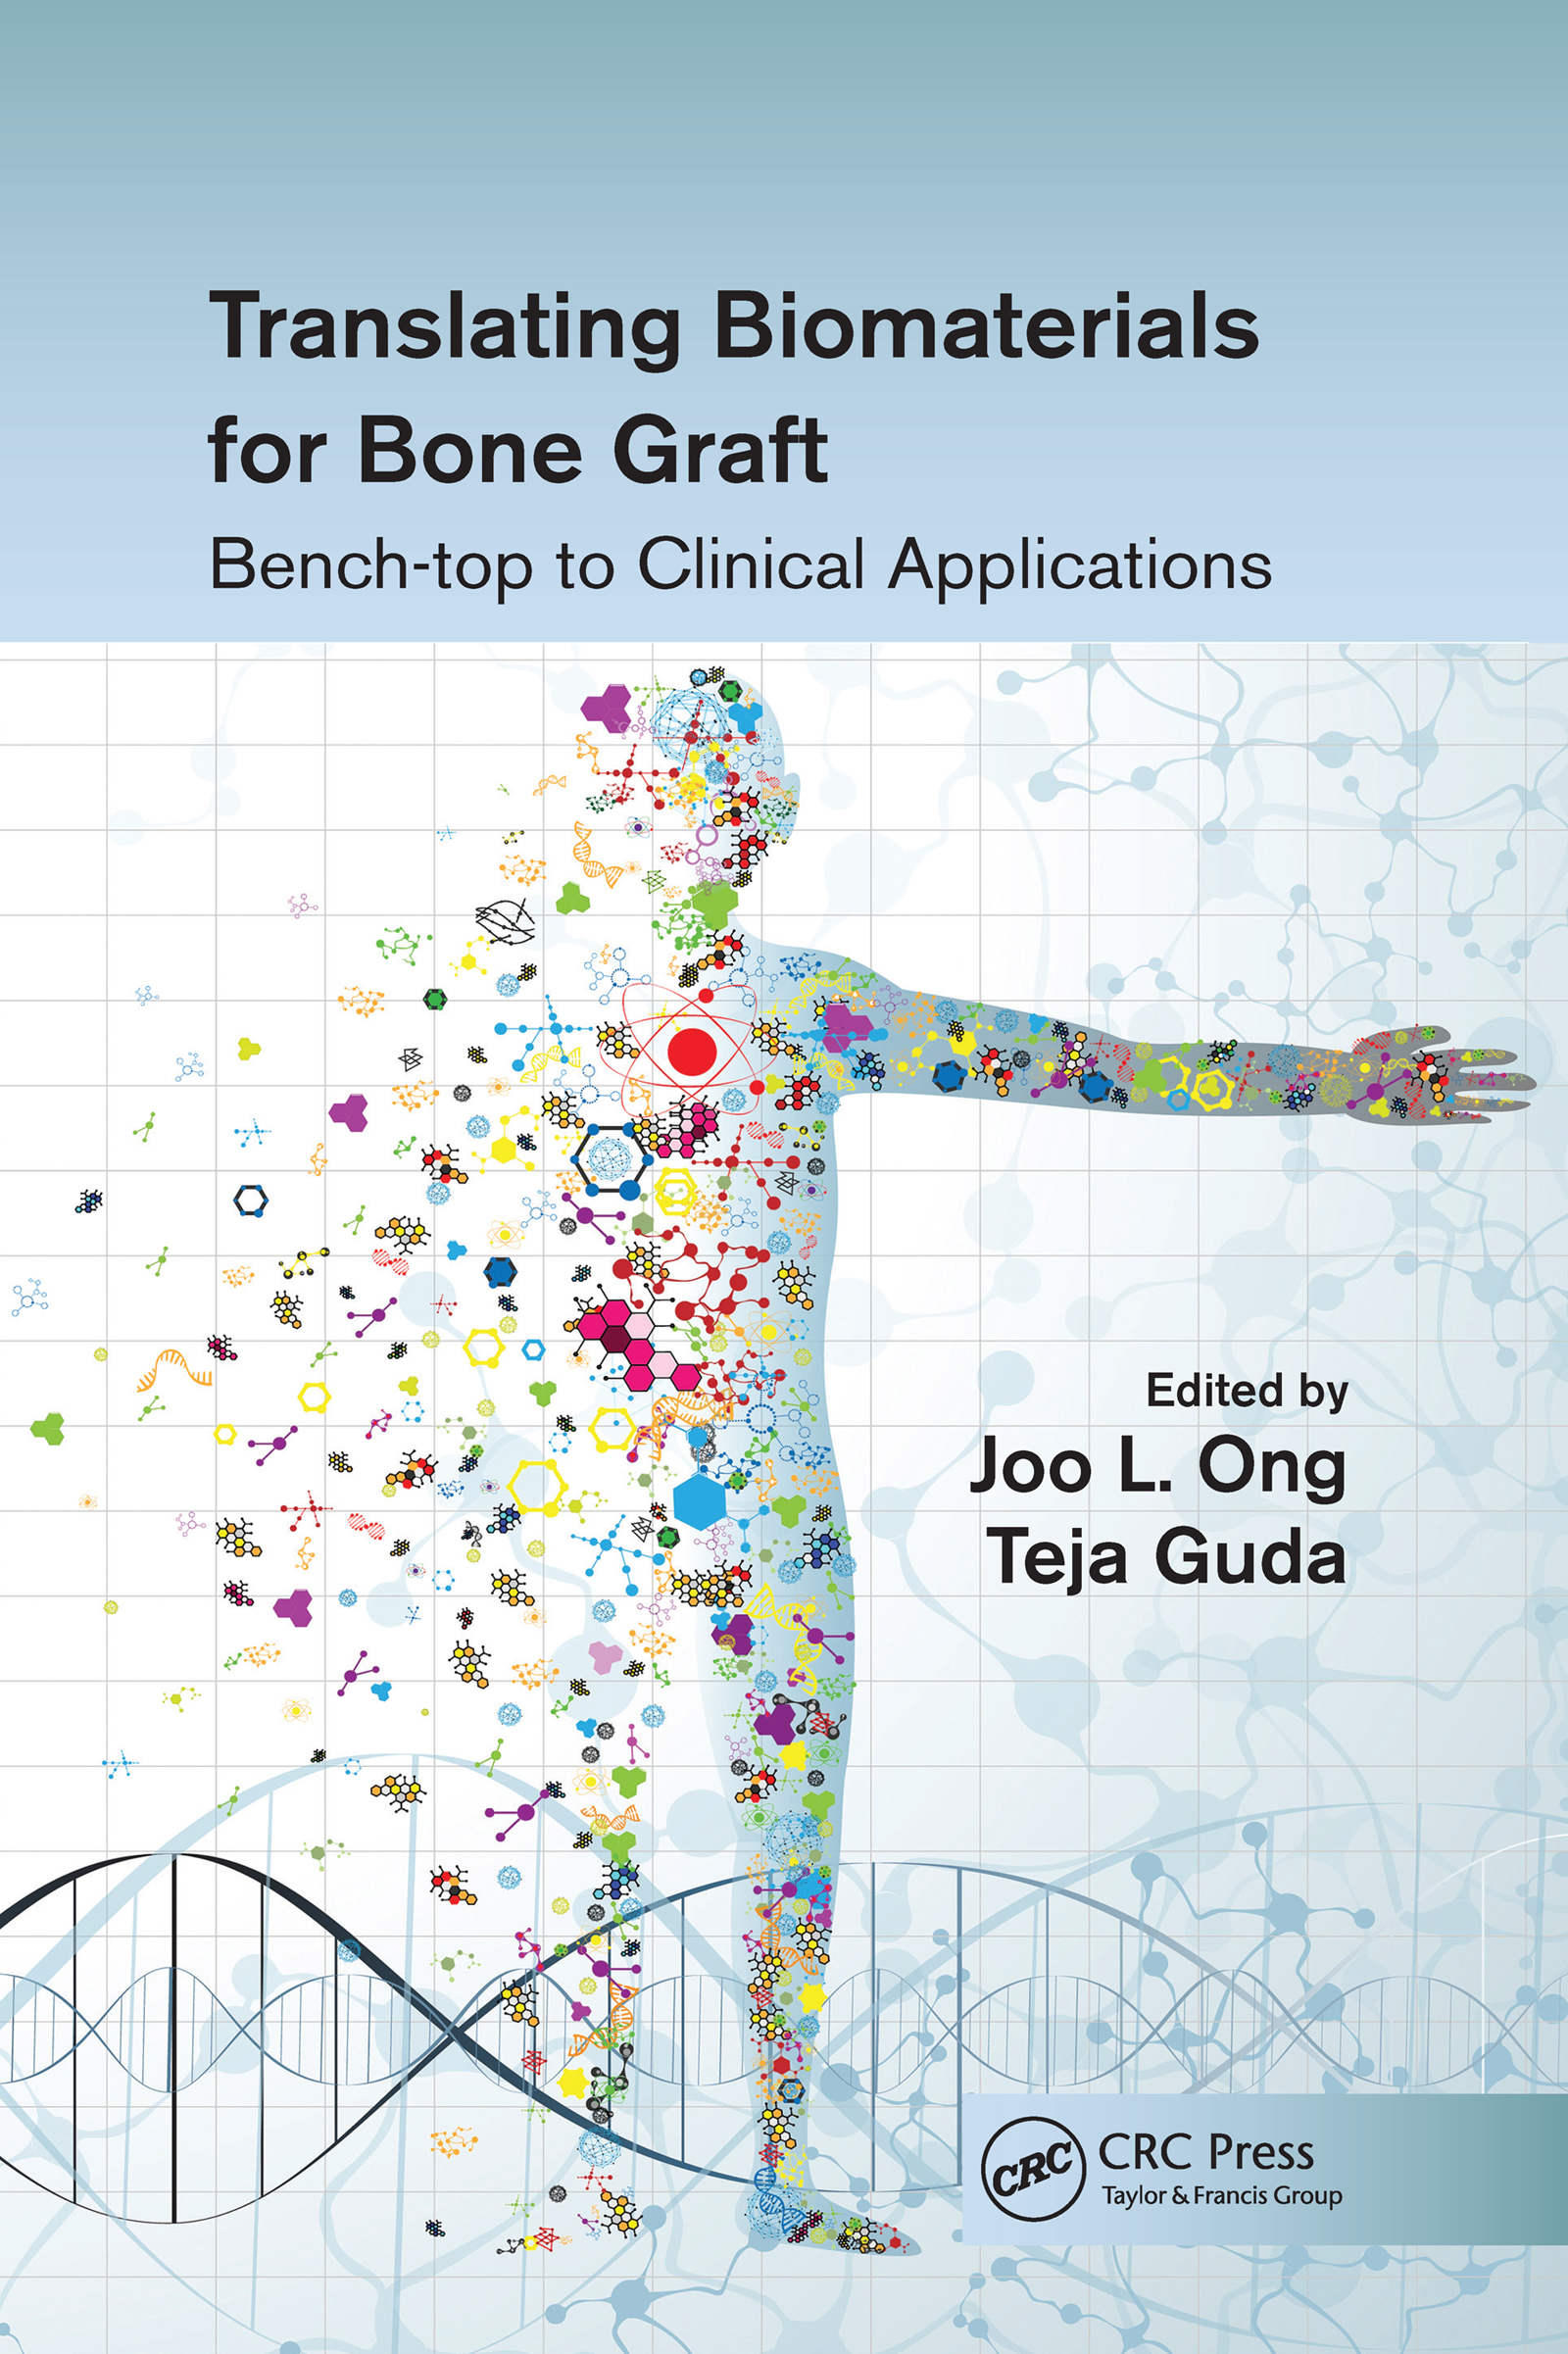 Translating Biomaterials for Bone Graft